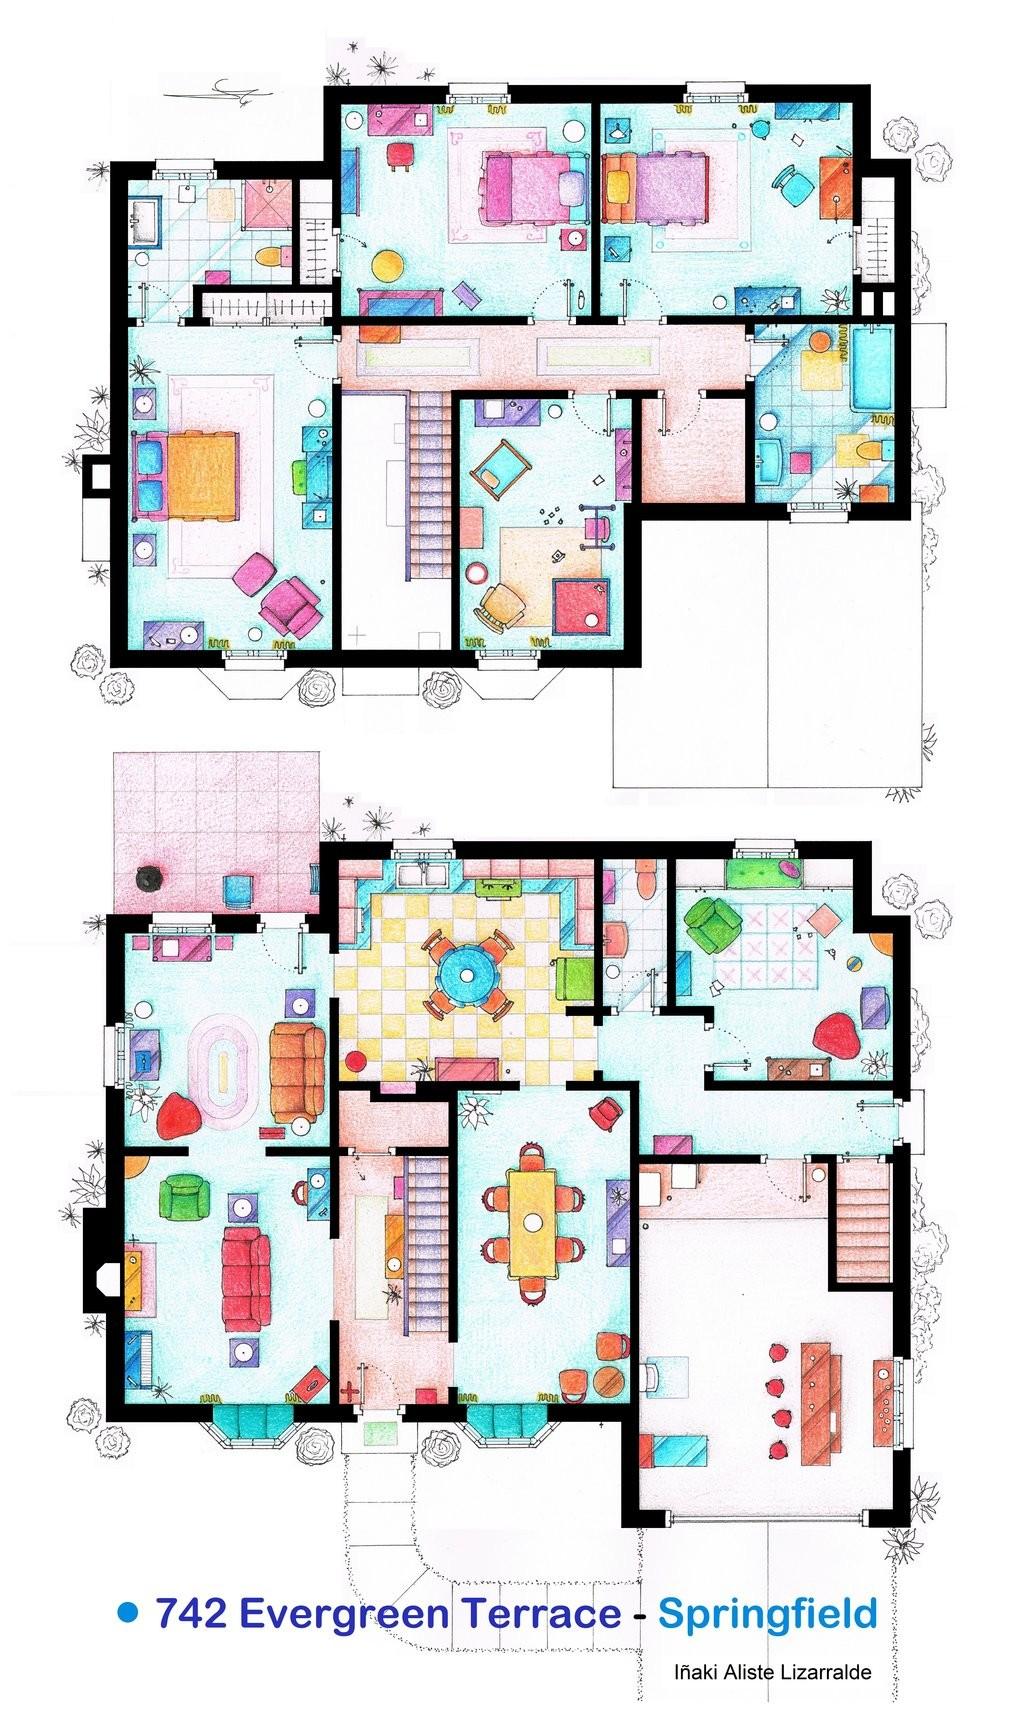 house_of_simpson_family___both_floorplans_by_nikneuk-d5tzvau_(1).jpg